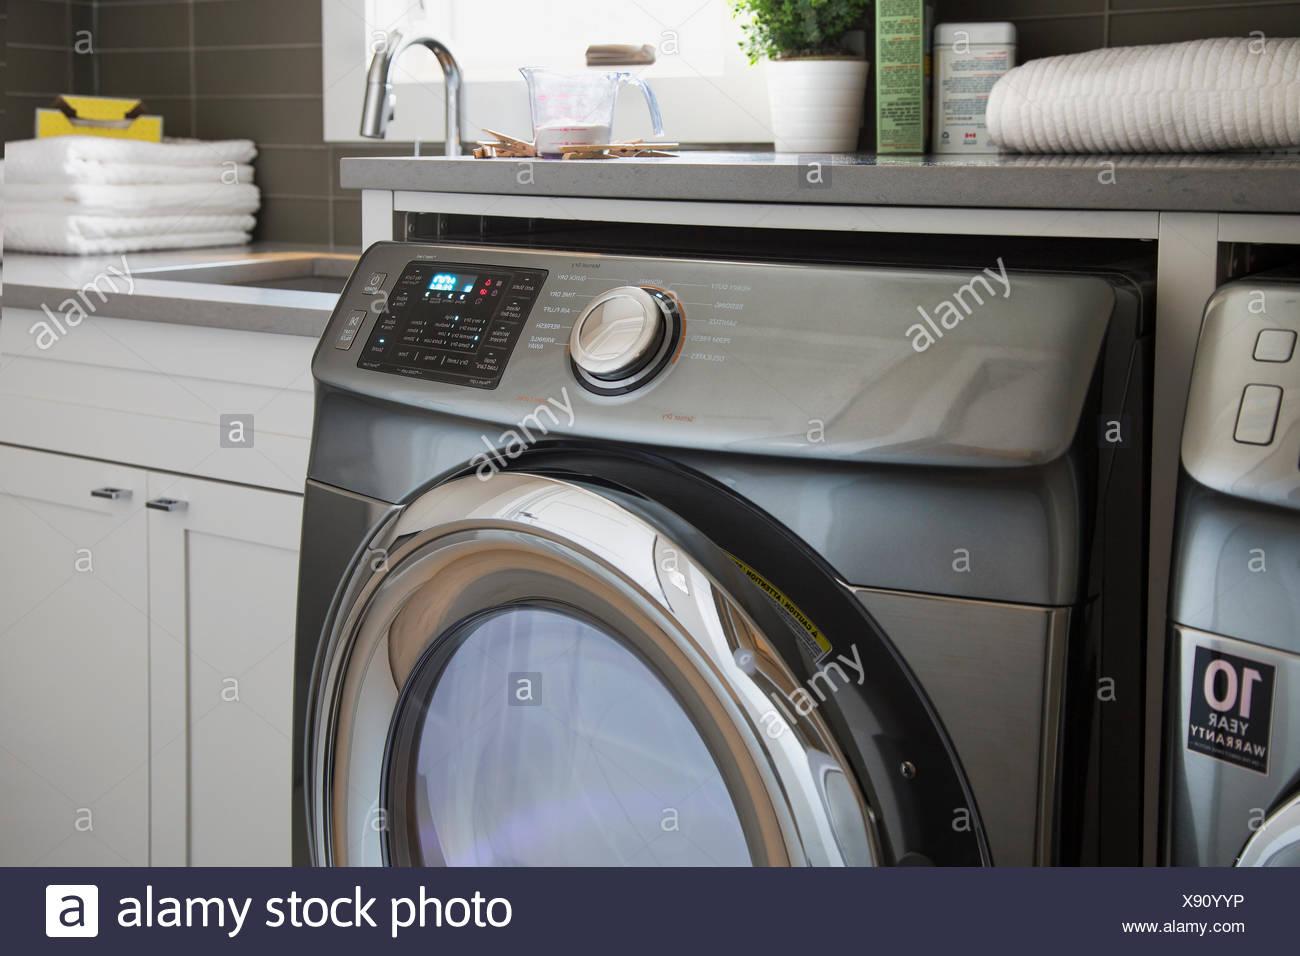 Energy efficient washing machine in laundry room - Stock Image